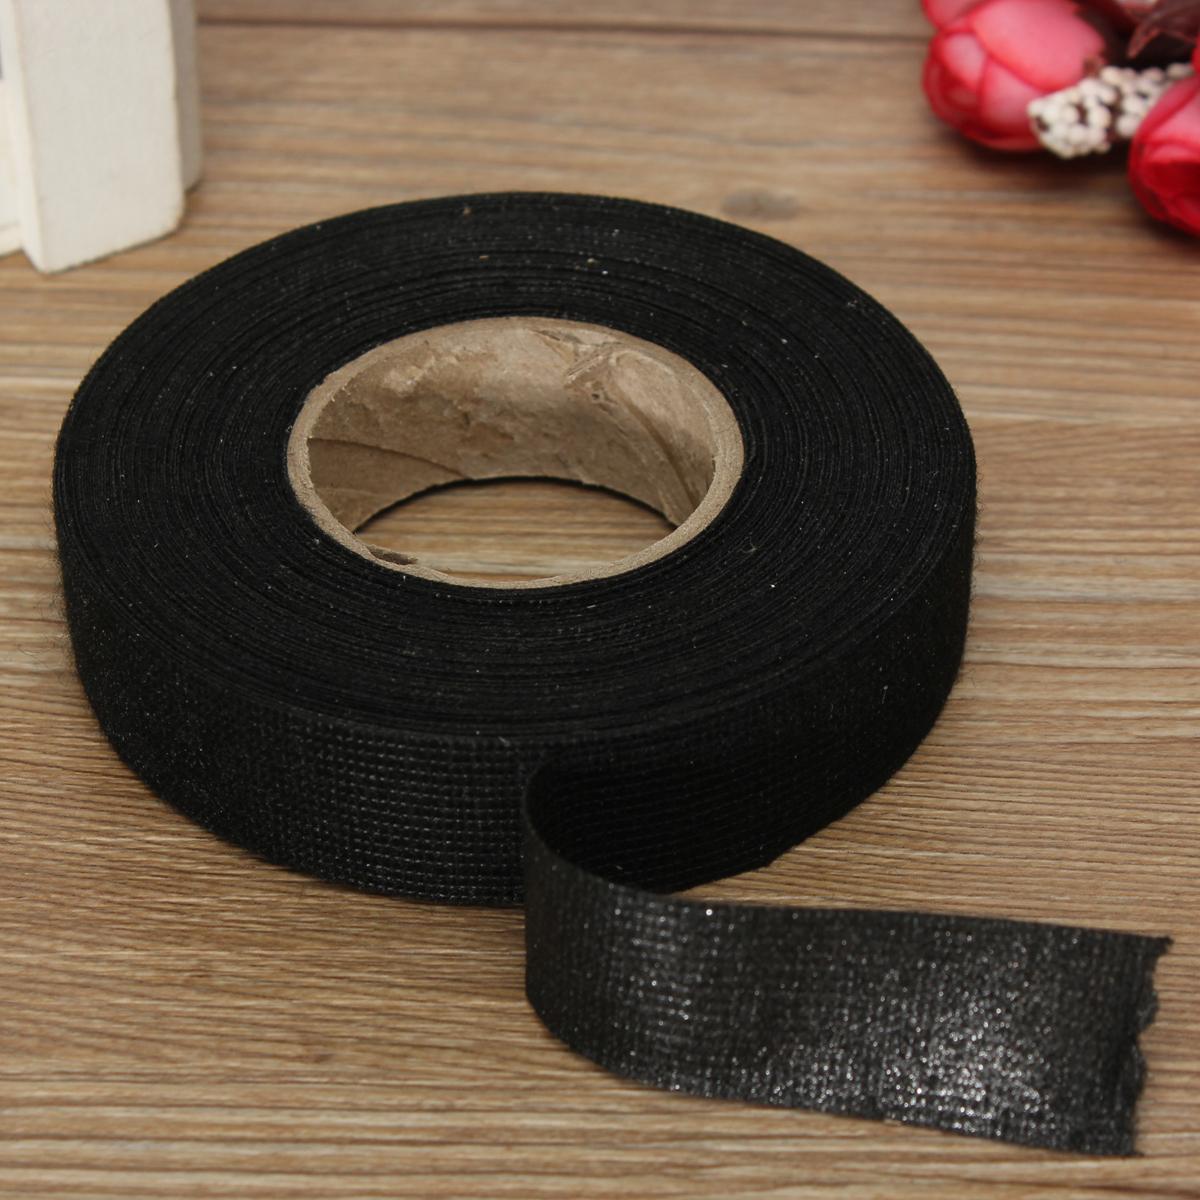 Wiring Loom Harness Adhesive Cloth Fabric Tape : Mmx m hot adhesive cloth fabric tape cable looms